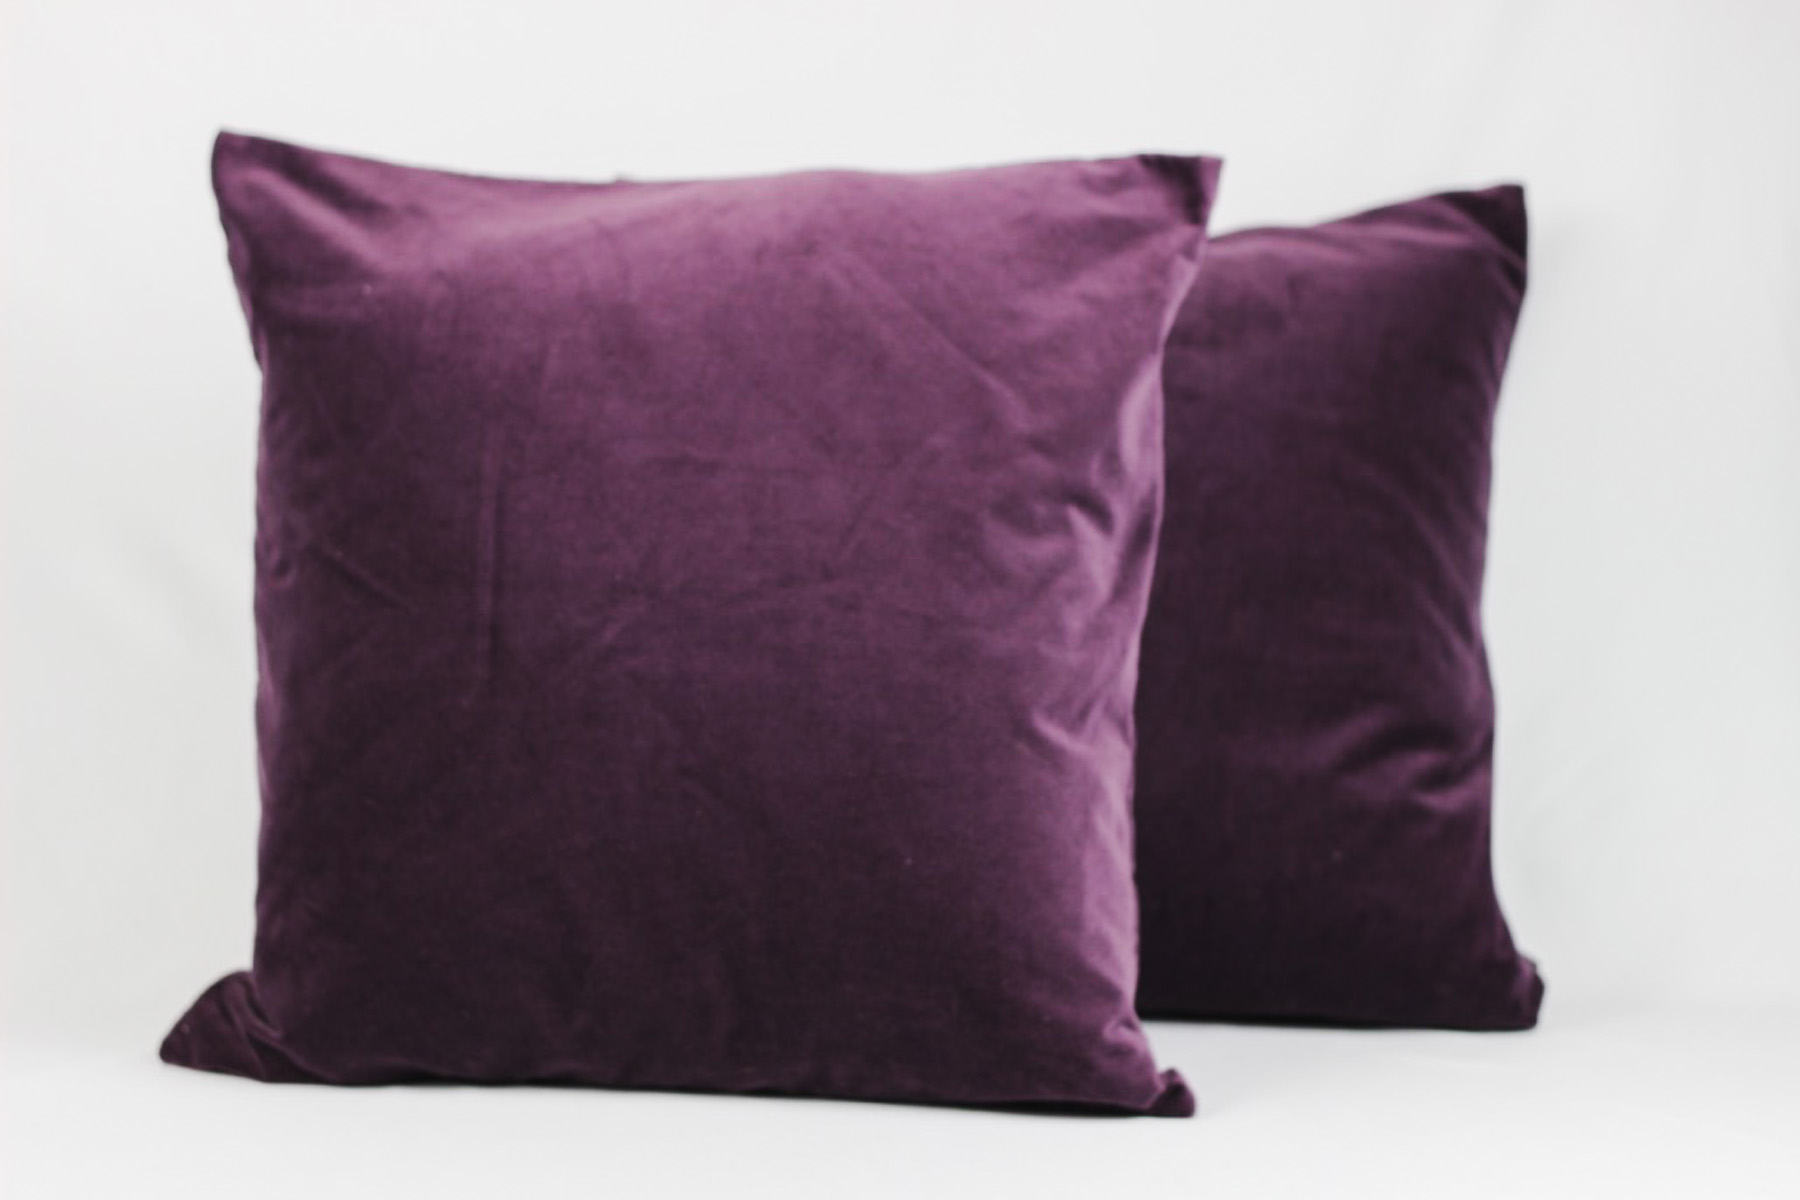 Purple Velvet Pillows - Scavenged Vintage Rentals